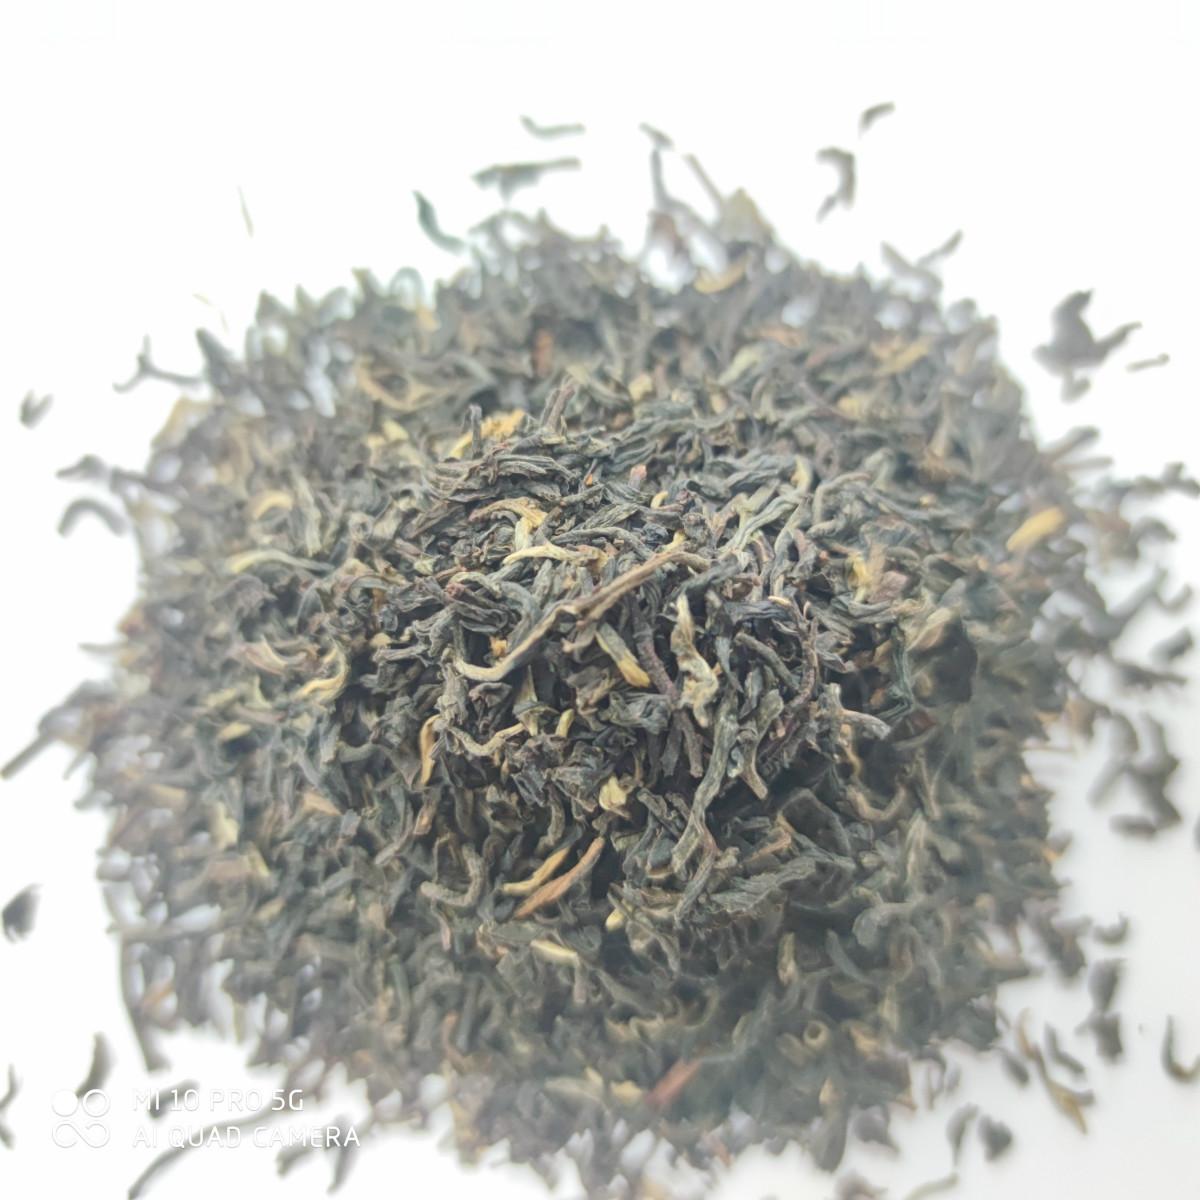 Factory direct supply anhua black tea with cheapest price - 4uTea | 4uTea.com